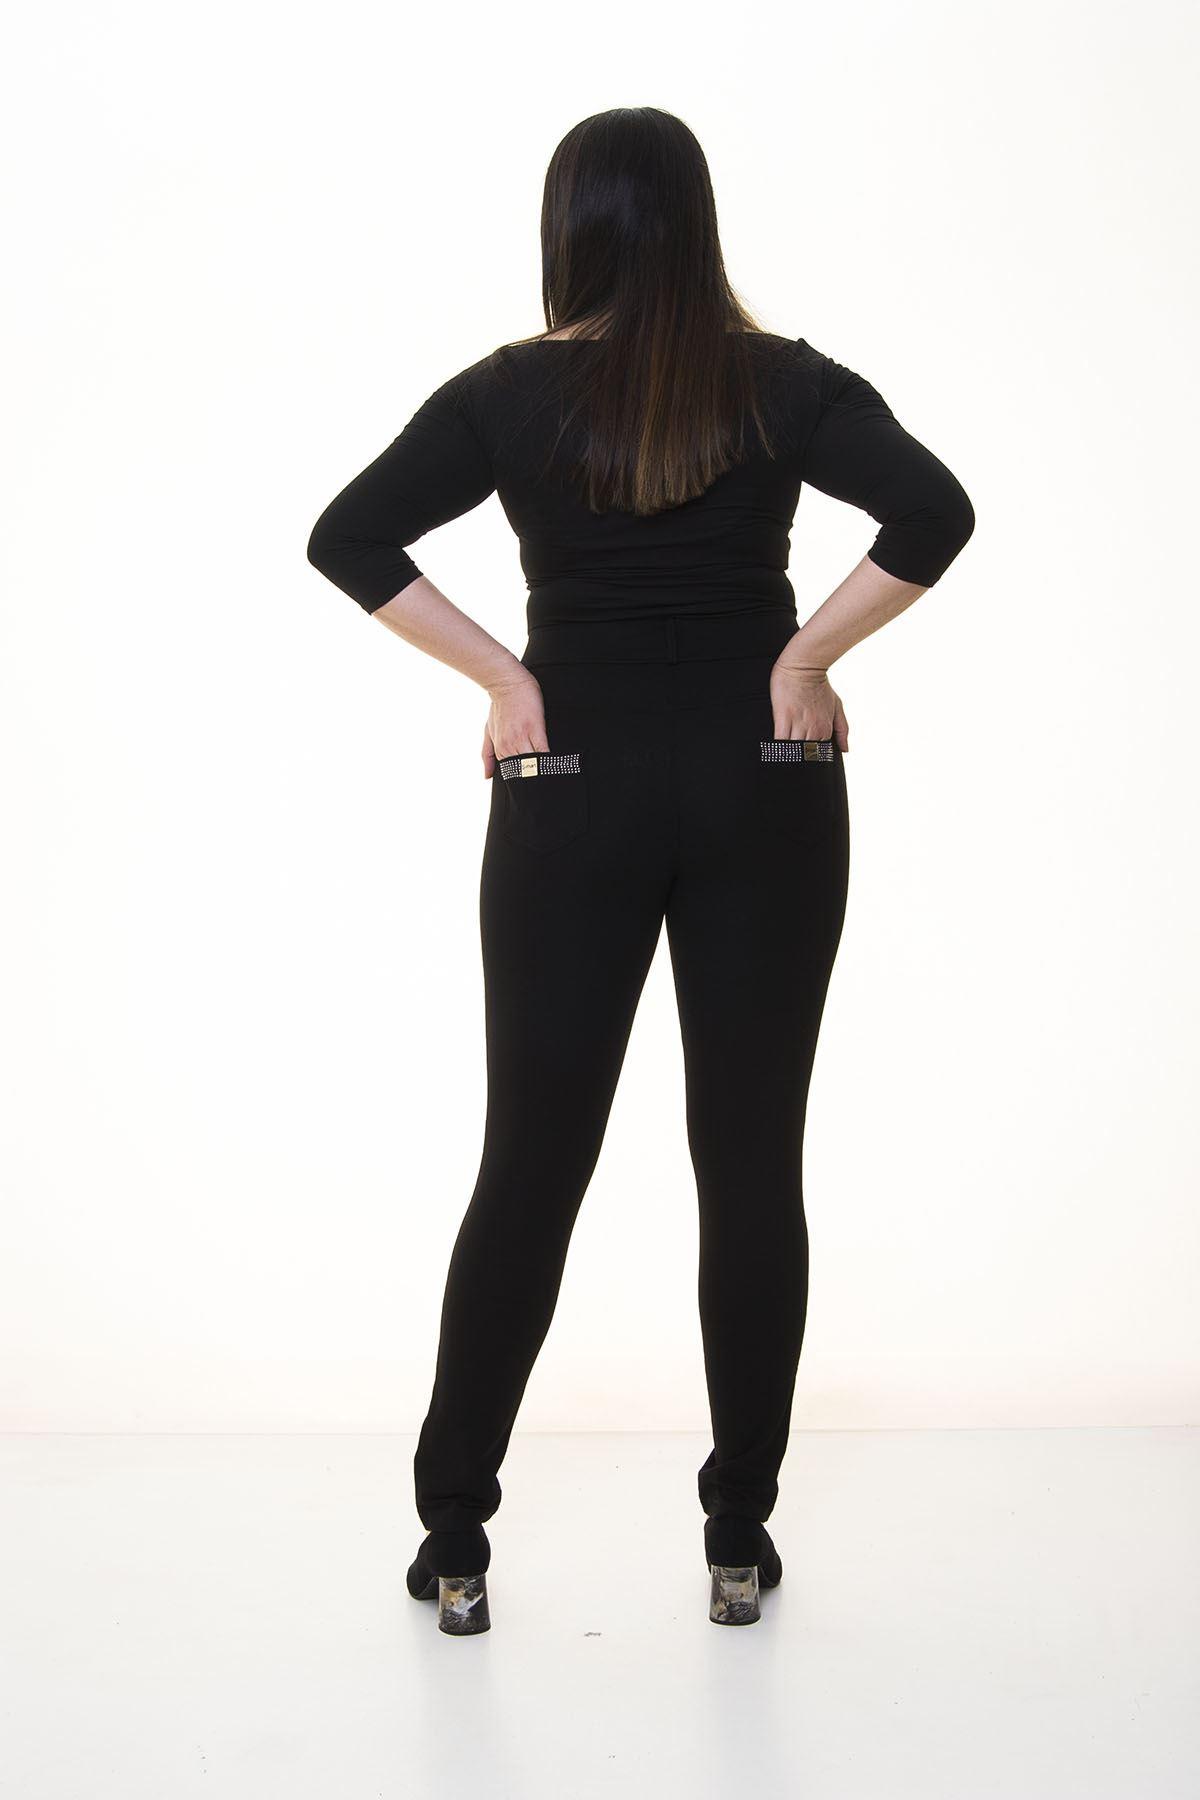 Siyah Cepli Toparlayıcı Pantolon 5B-1390